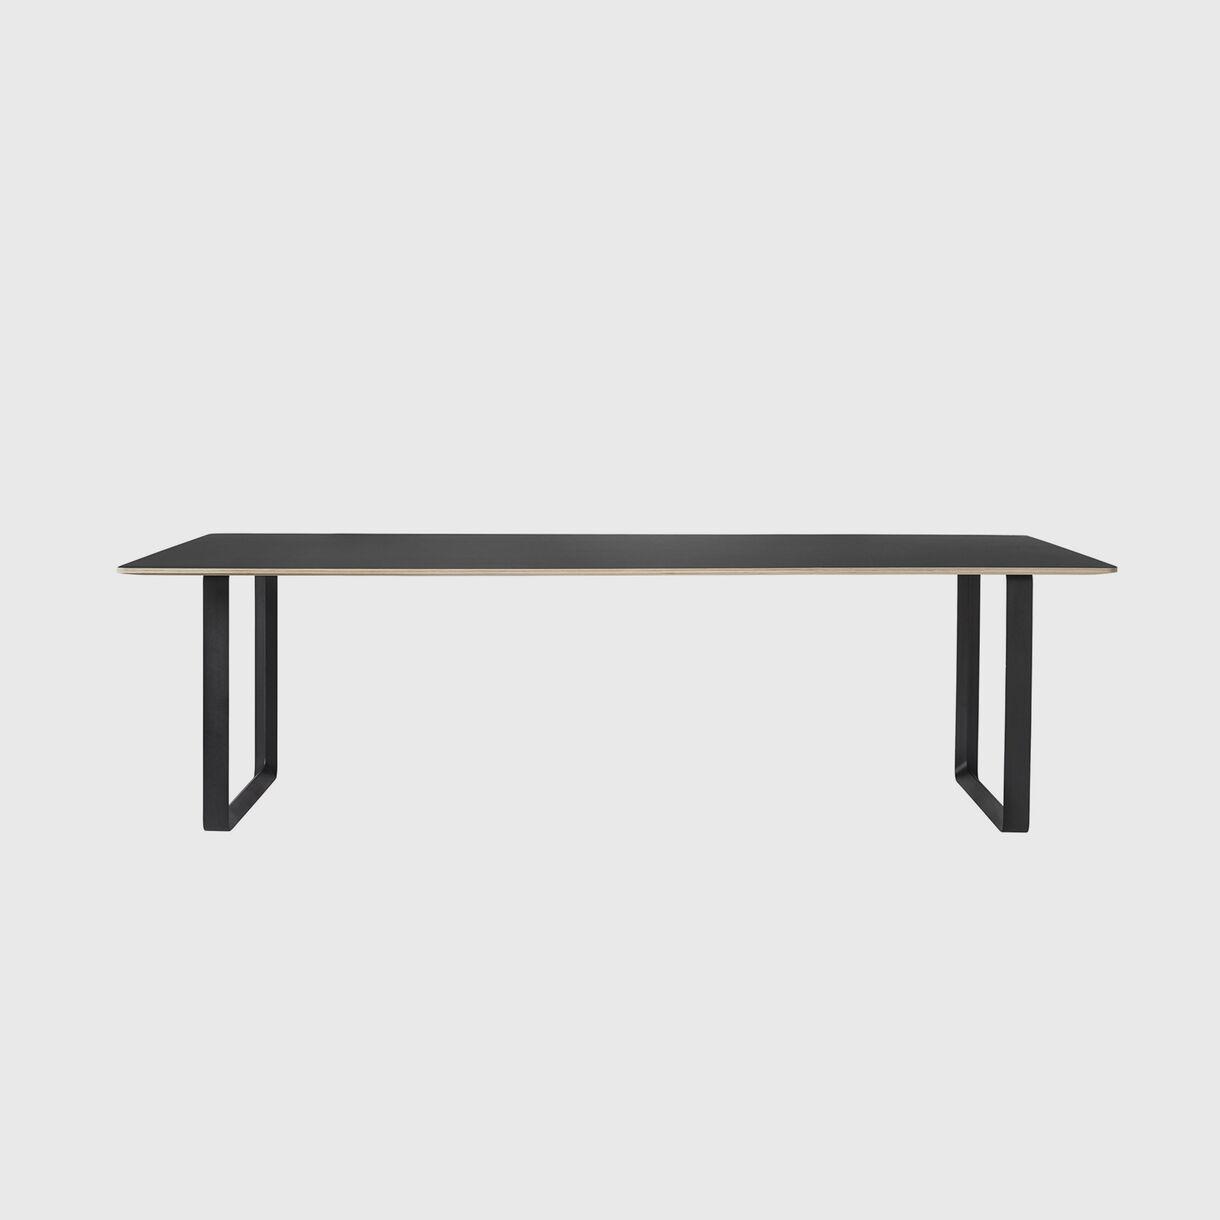 70/70 Table, 2550 x 1080, Black